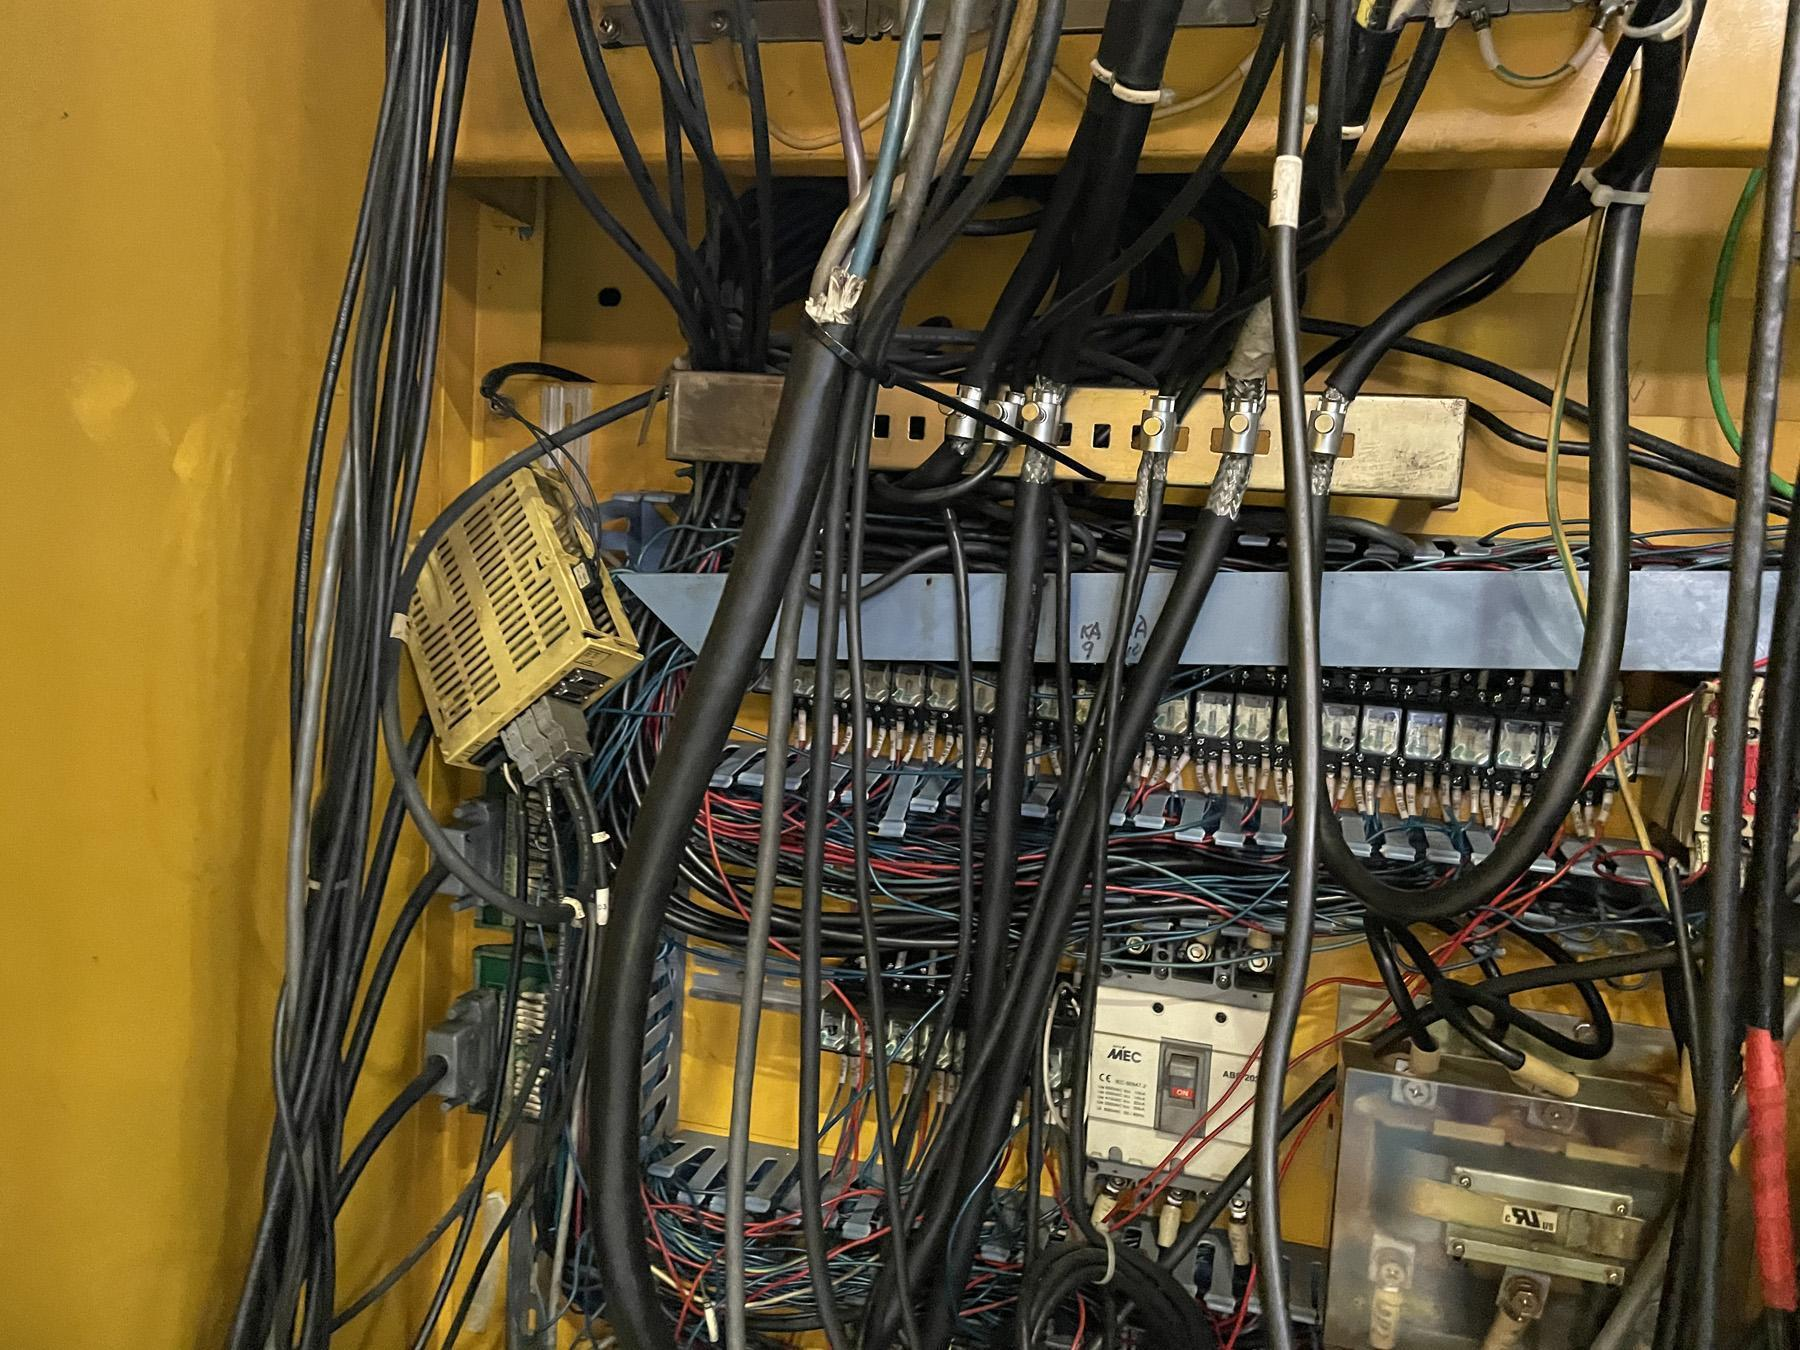 USED, VANGUARD VMC-21100 CNC VERTICAL MACHINING CENTER